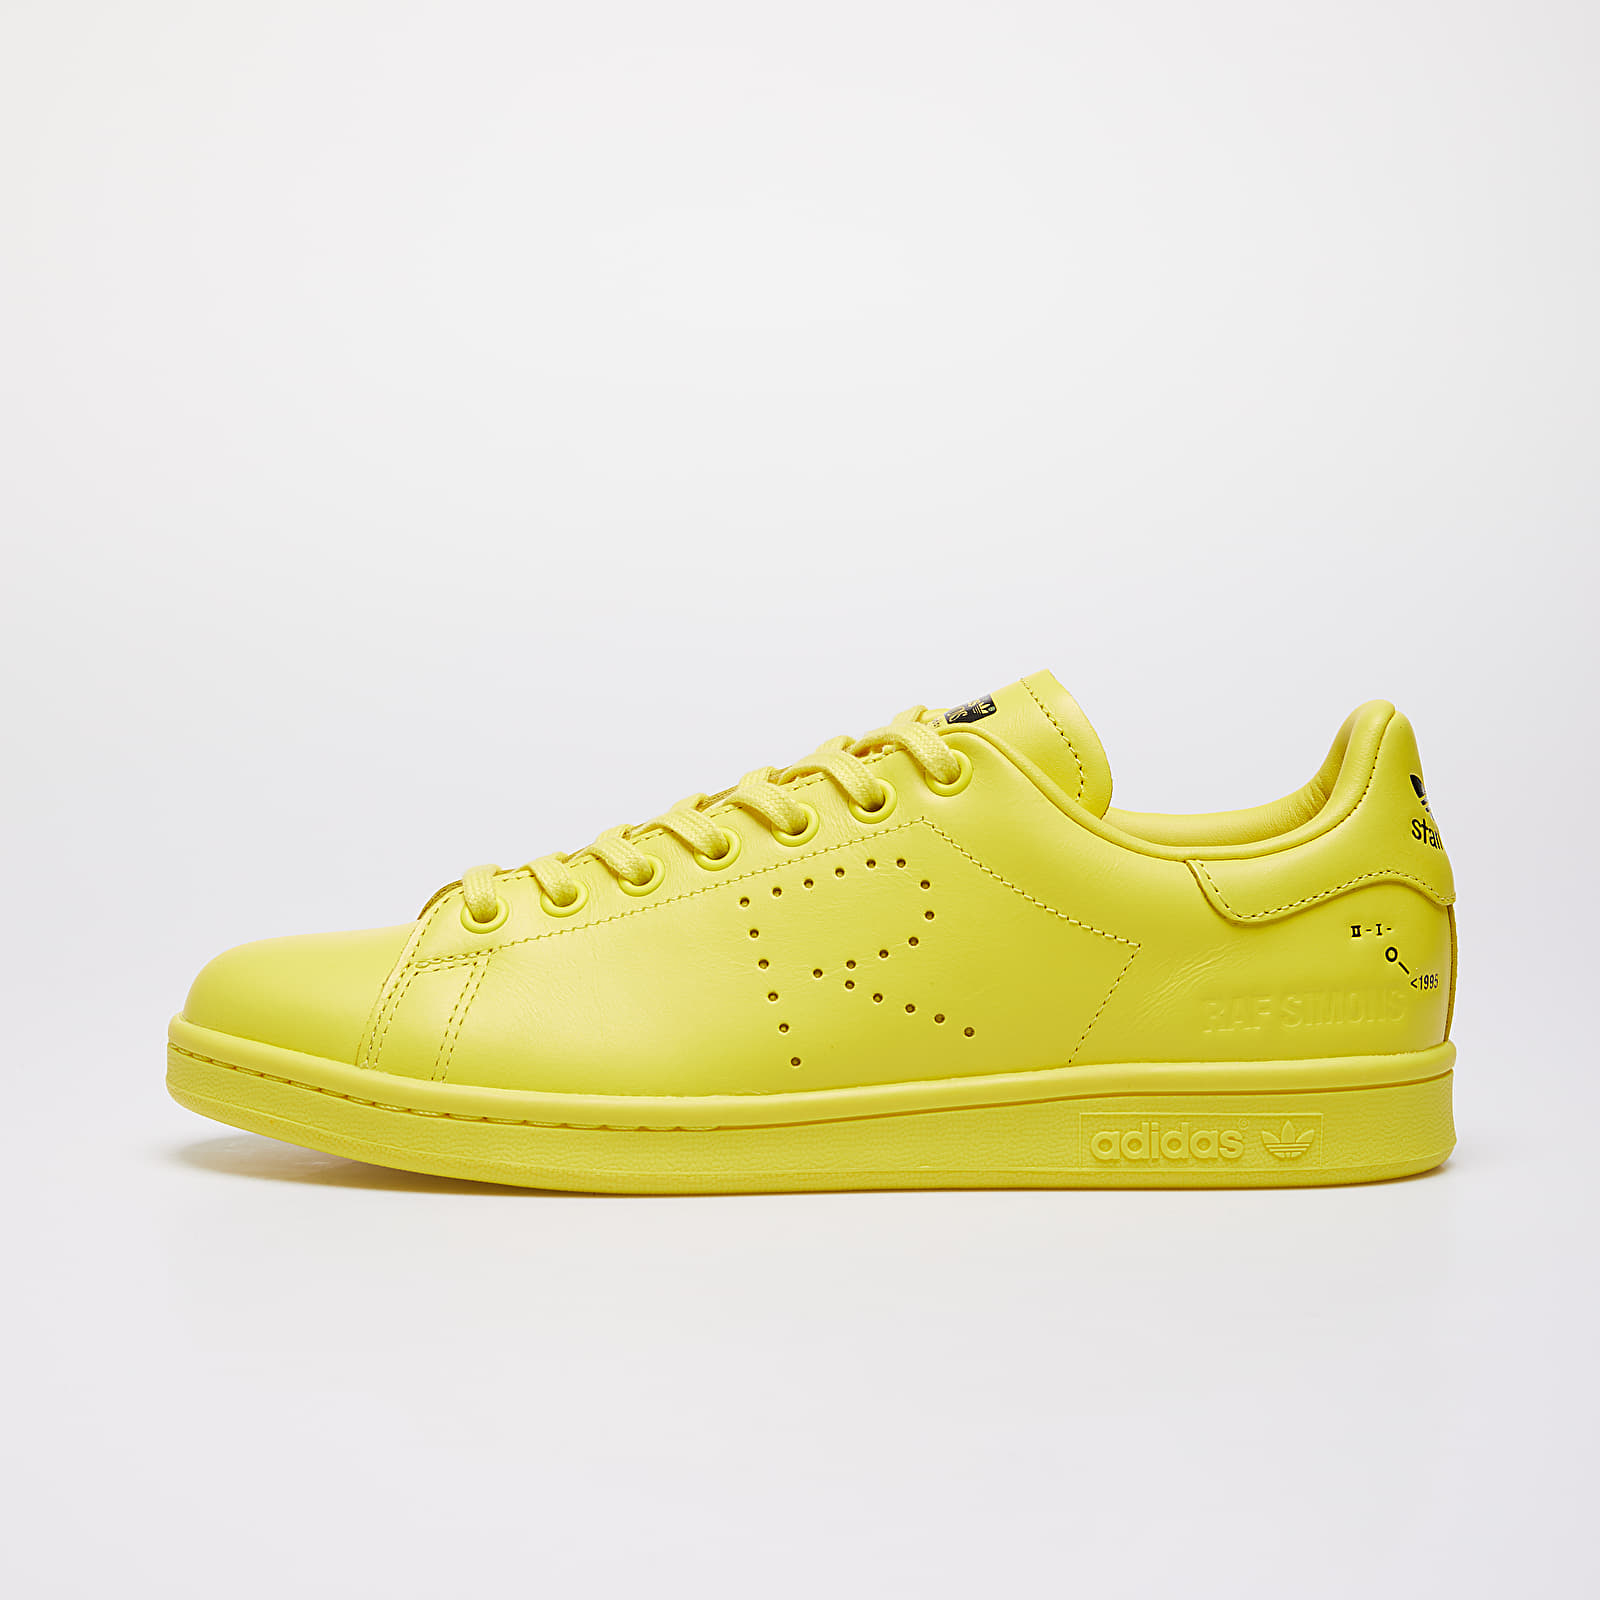 Men's shoes adidas x Raf Simons Stan Smith Bright Yellow/ Pure Yellow S08/ Ftw White